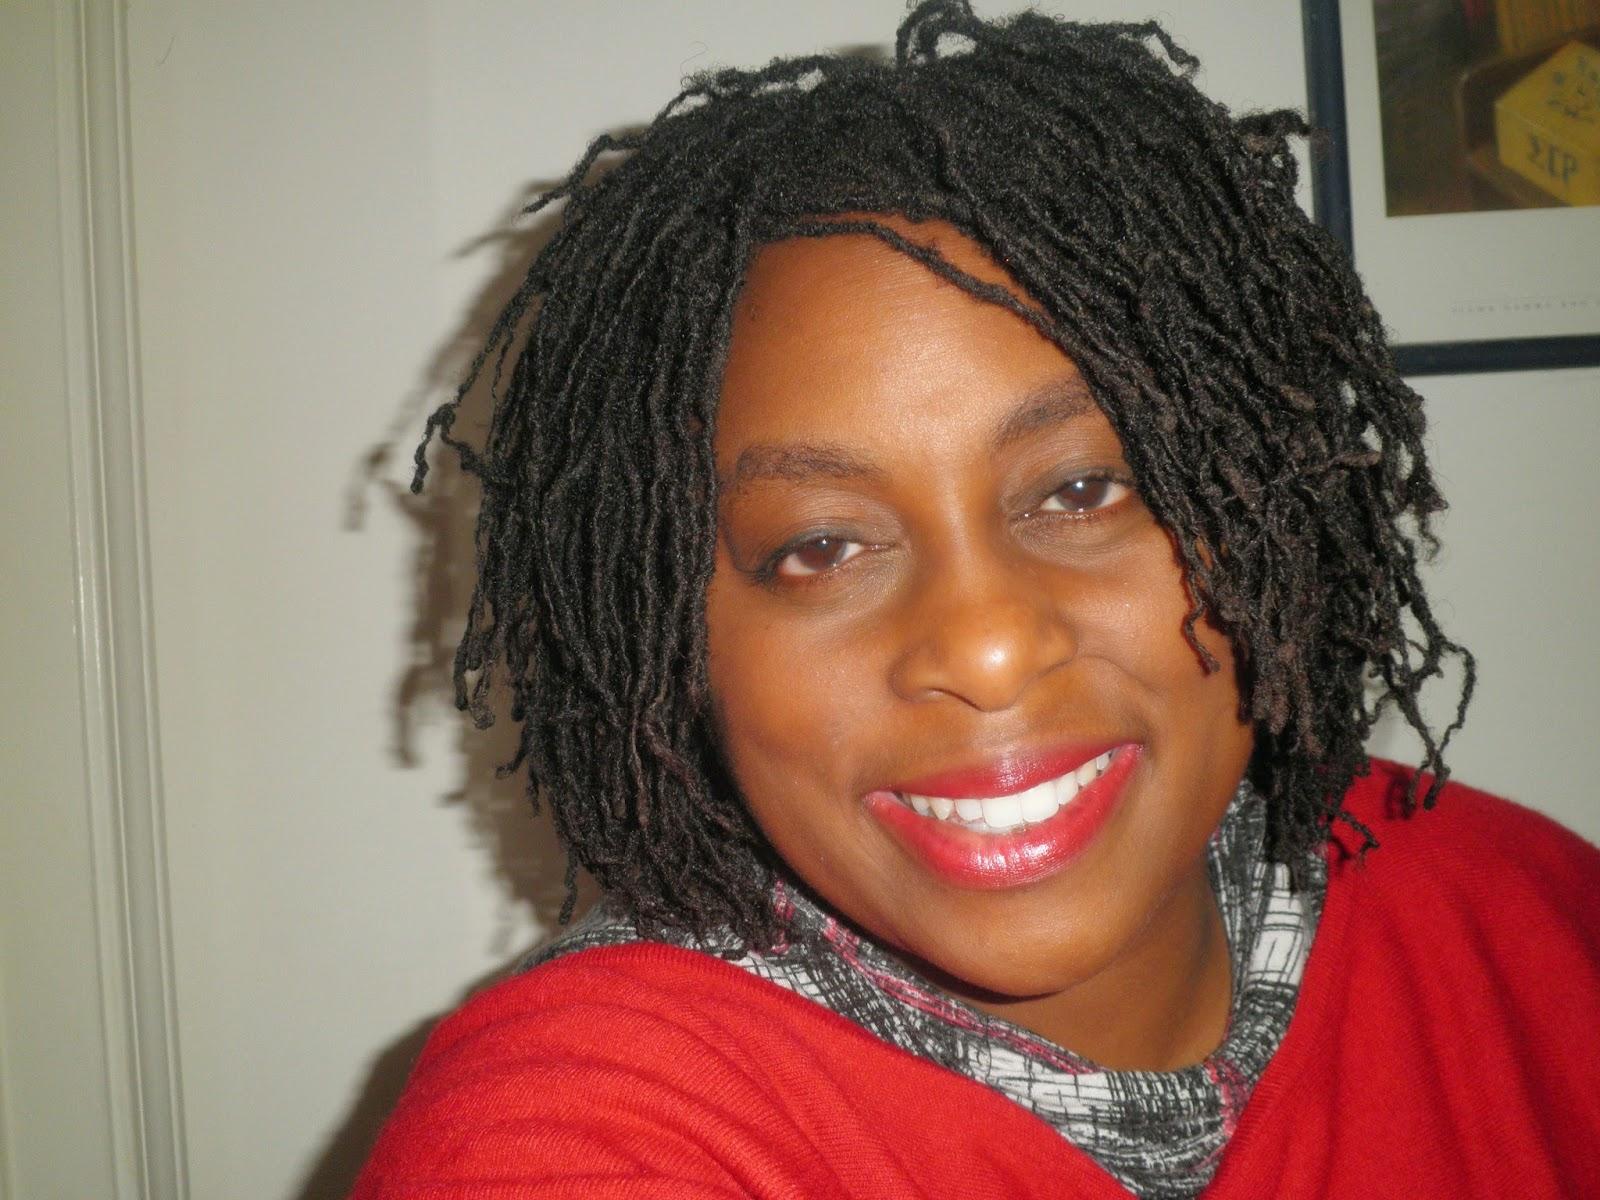 dave franco hairstyle : Cynthia Bailey Curly Bob Hairstyle \x3cb\x3ebailey hair cynthia bailey ...